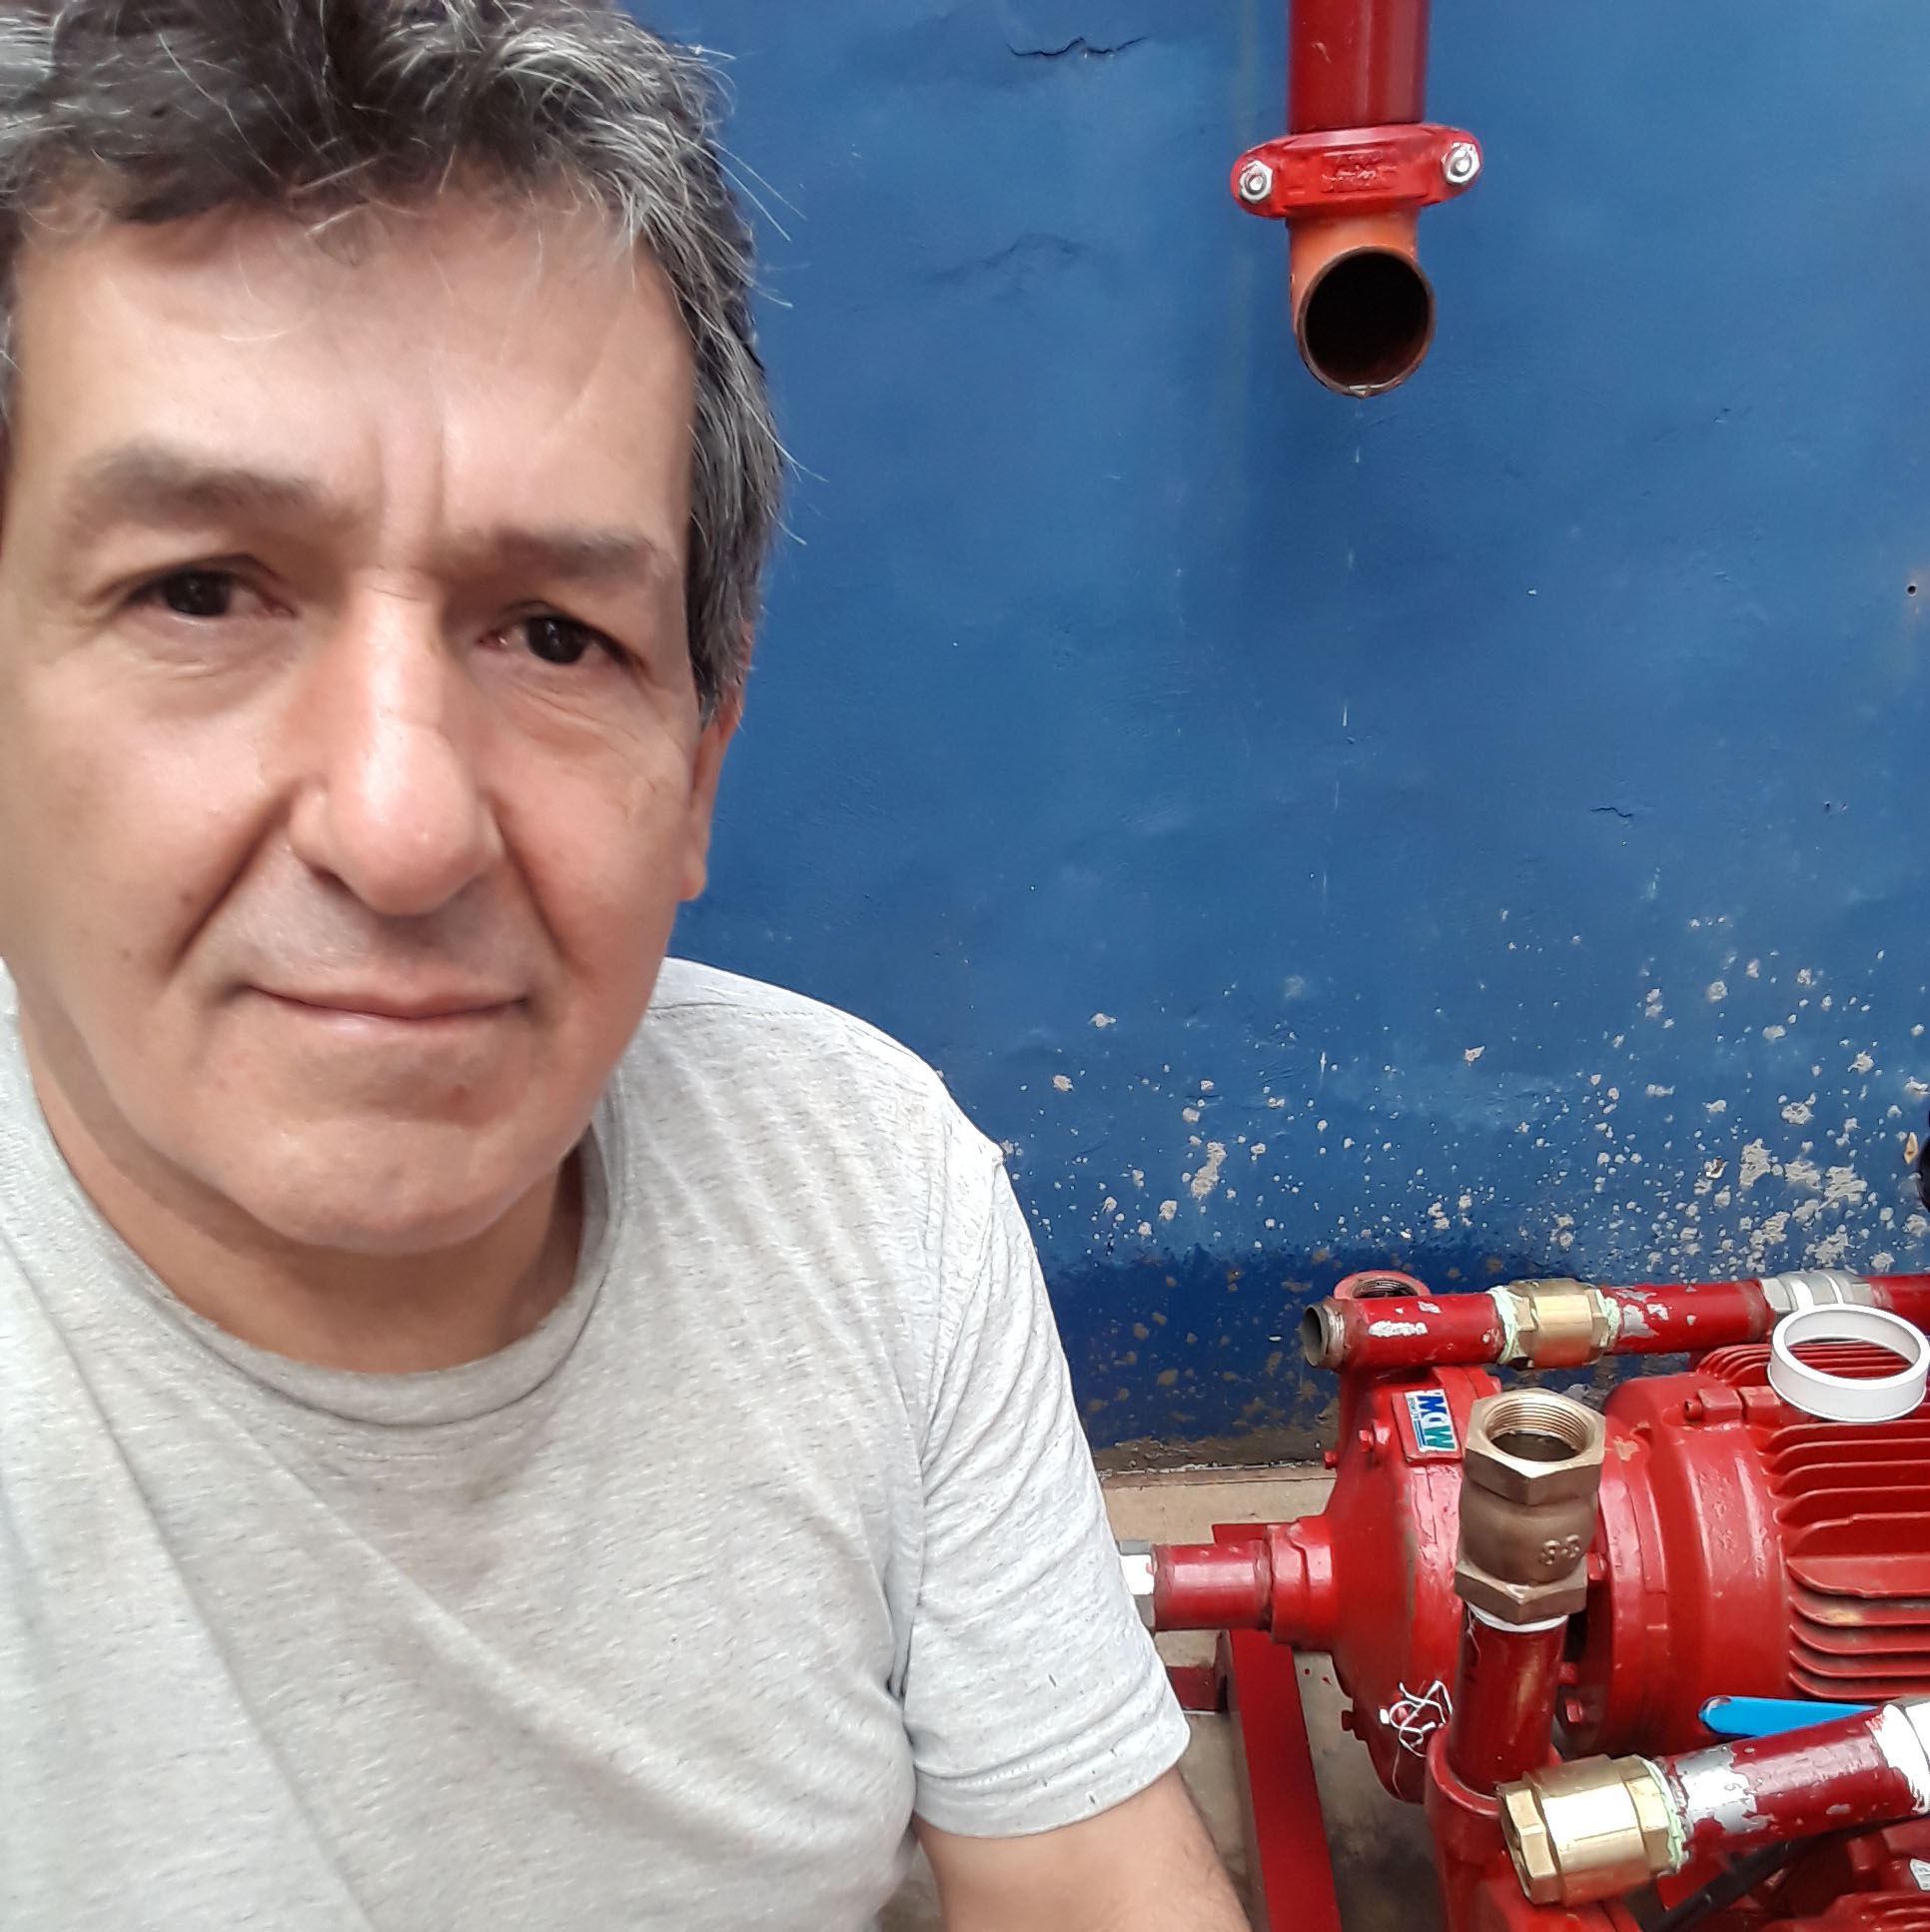 Domingo Felix Gregorio